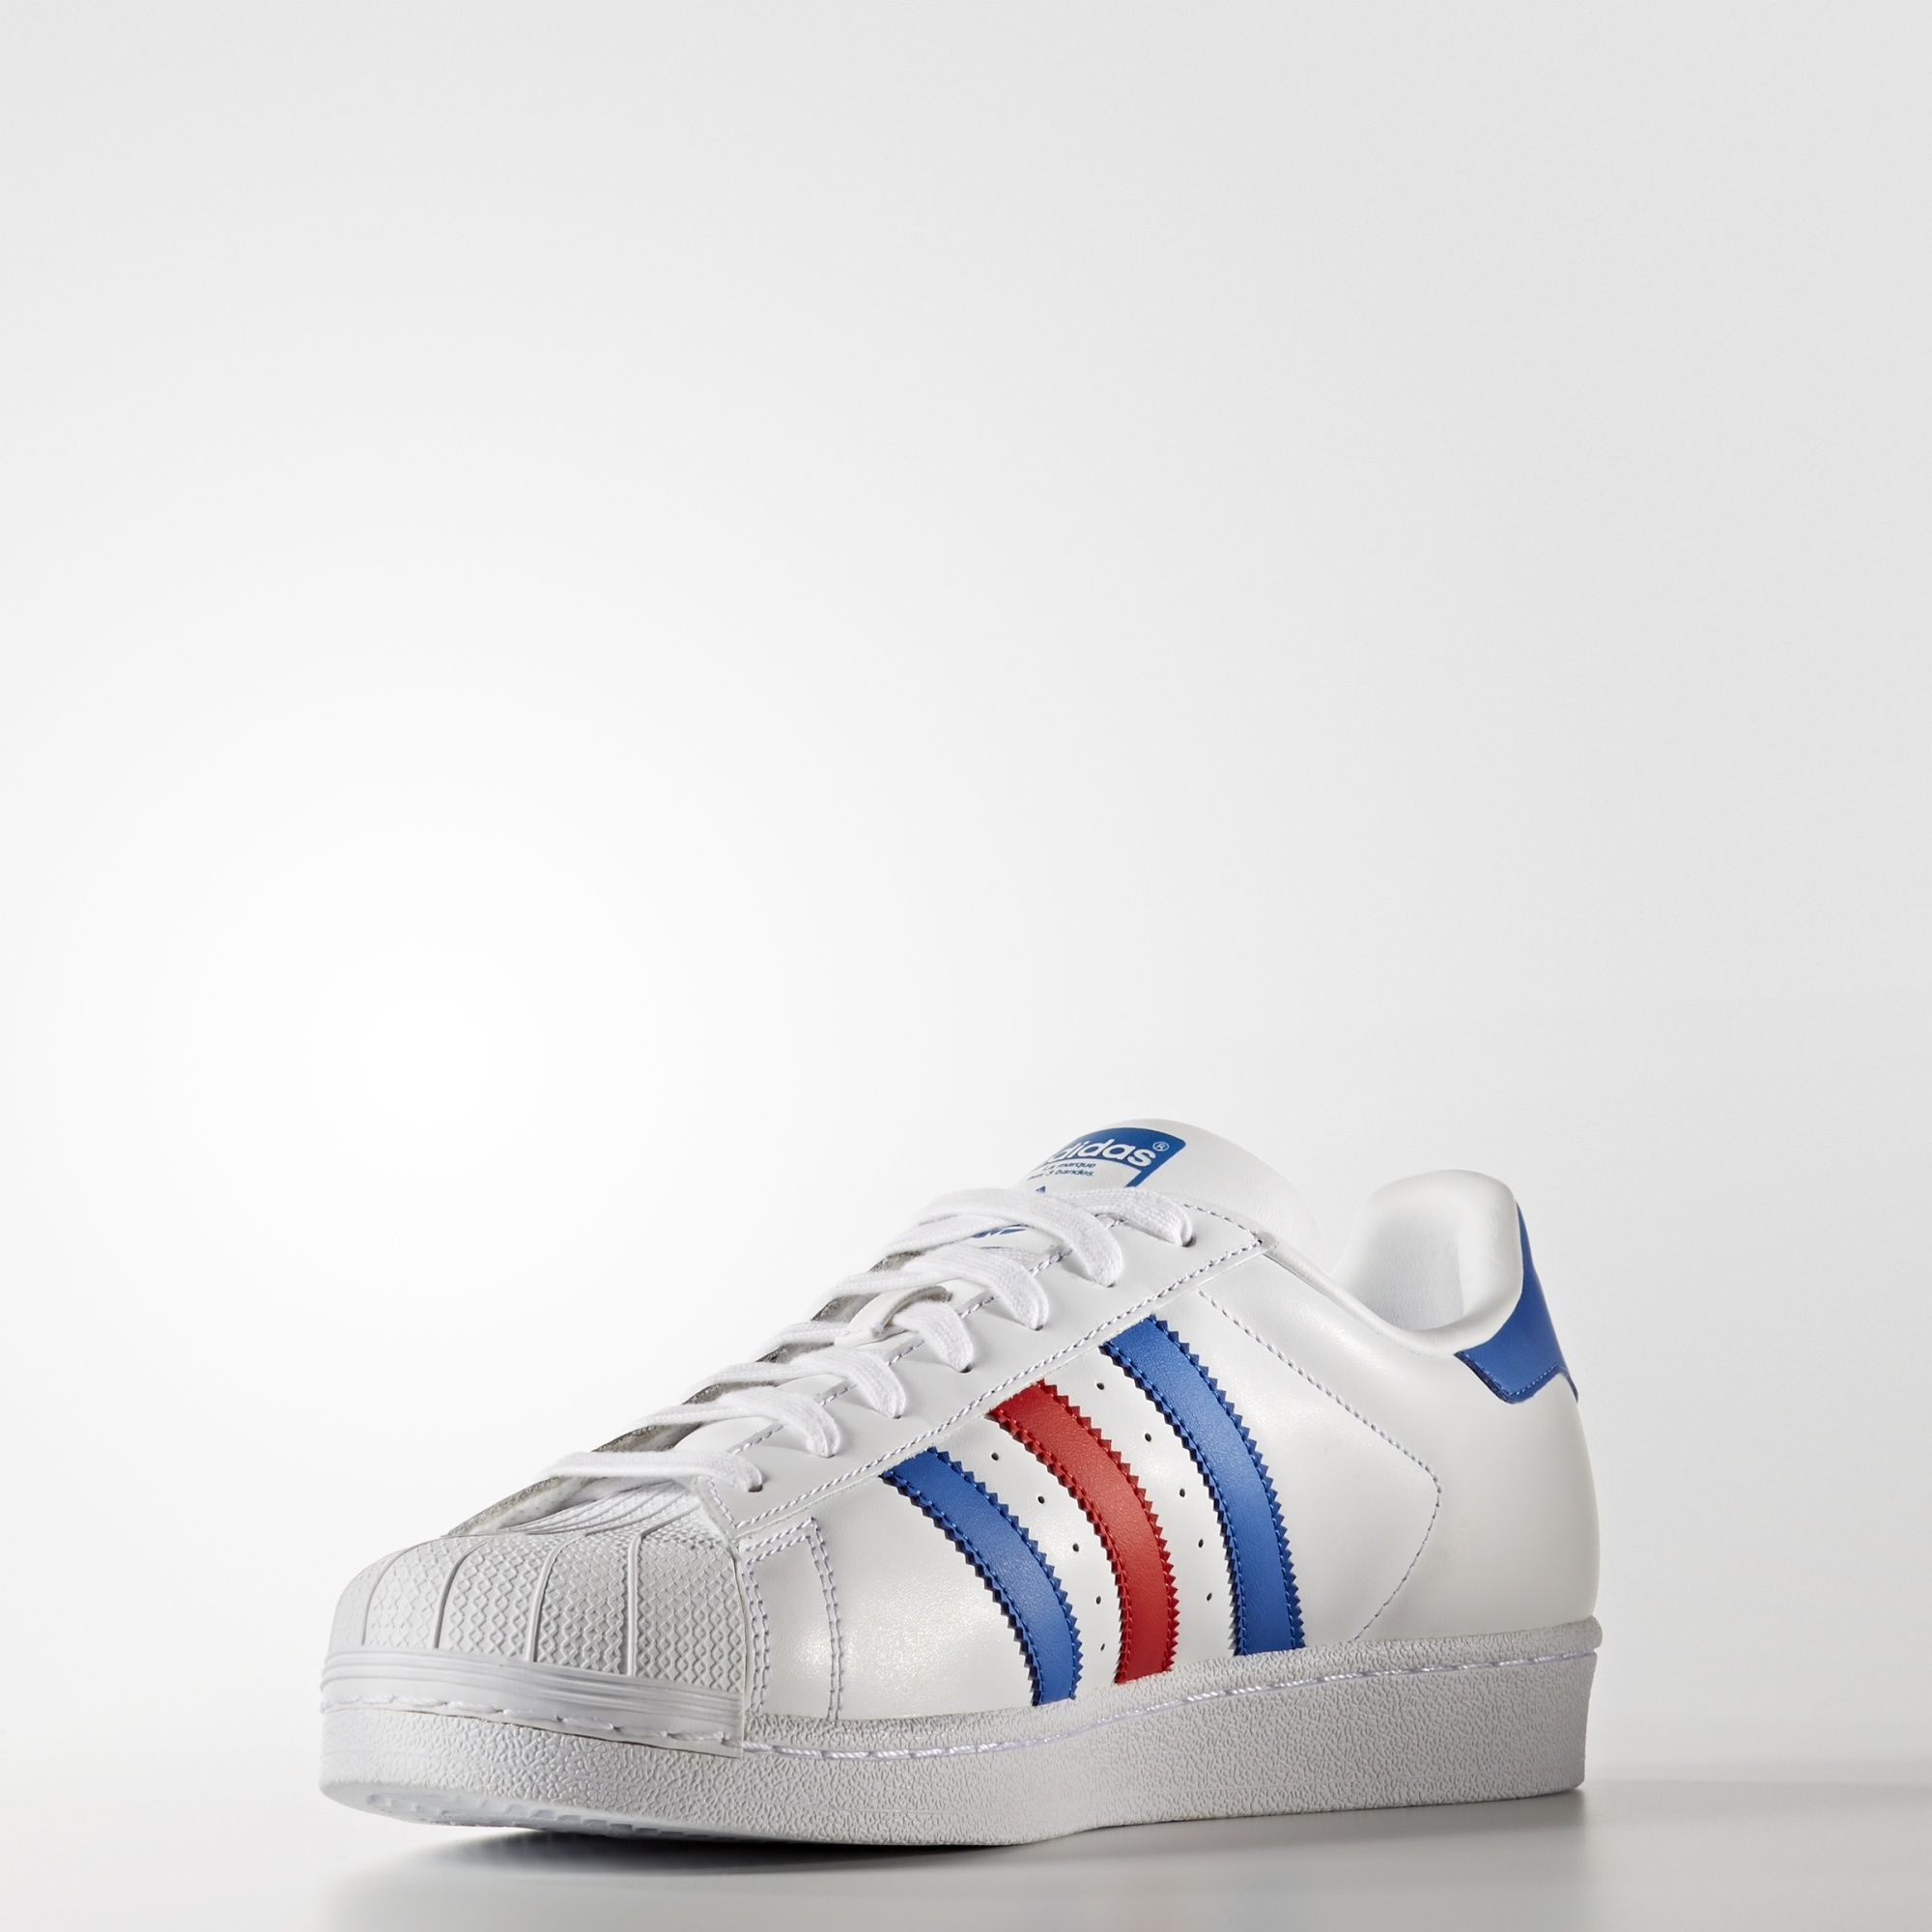 adidas Superstar Shoes Chaussures Superstars, Chaussures, Adidas  Superstars shoes, Shoes, Adidas